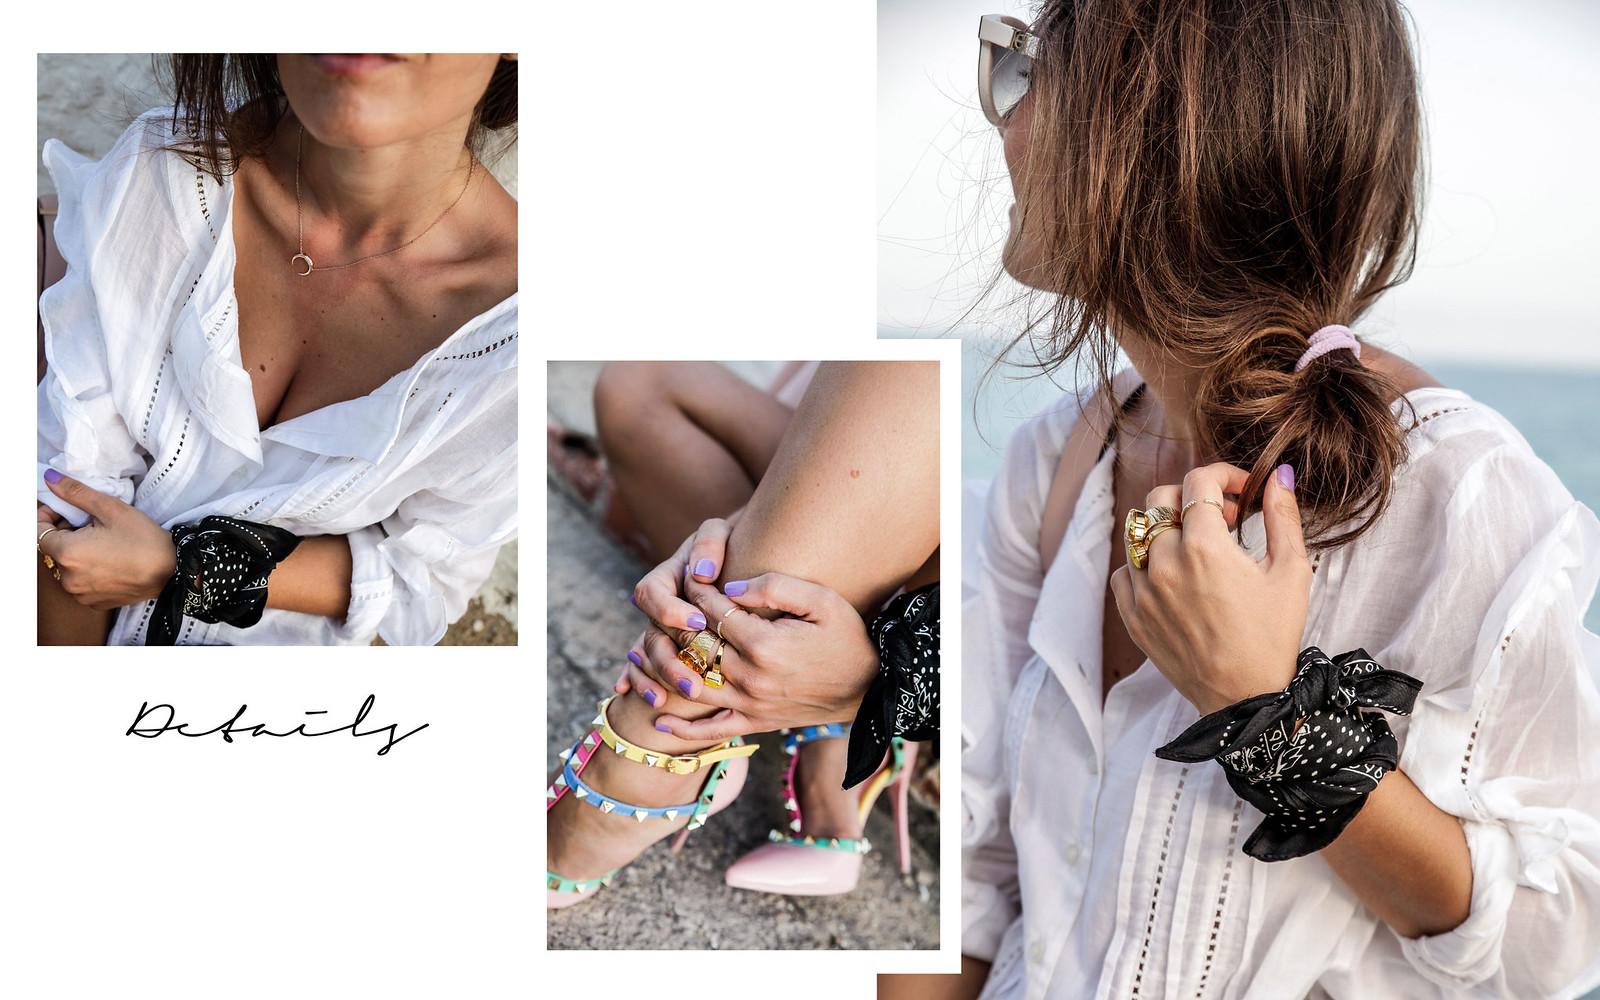 06_blusa_blanca_volantes_con_tacones_tachuelas_theguestgirl_black_white_outfit_storets_shorts